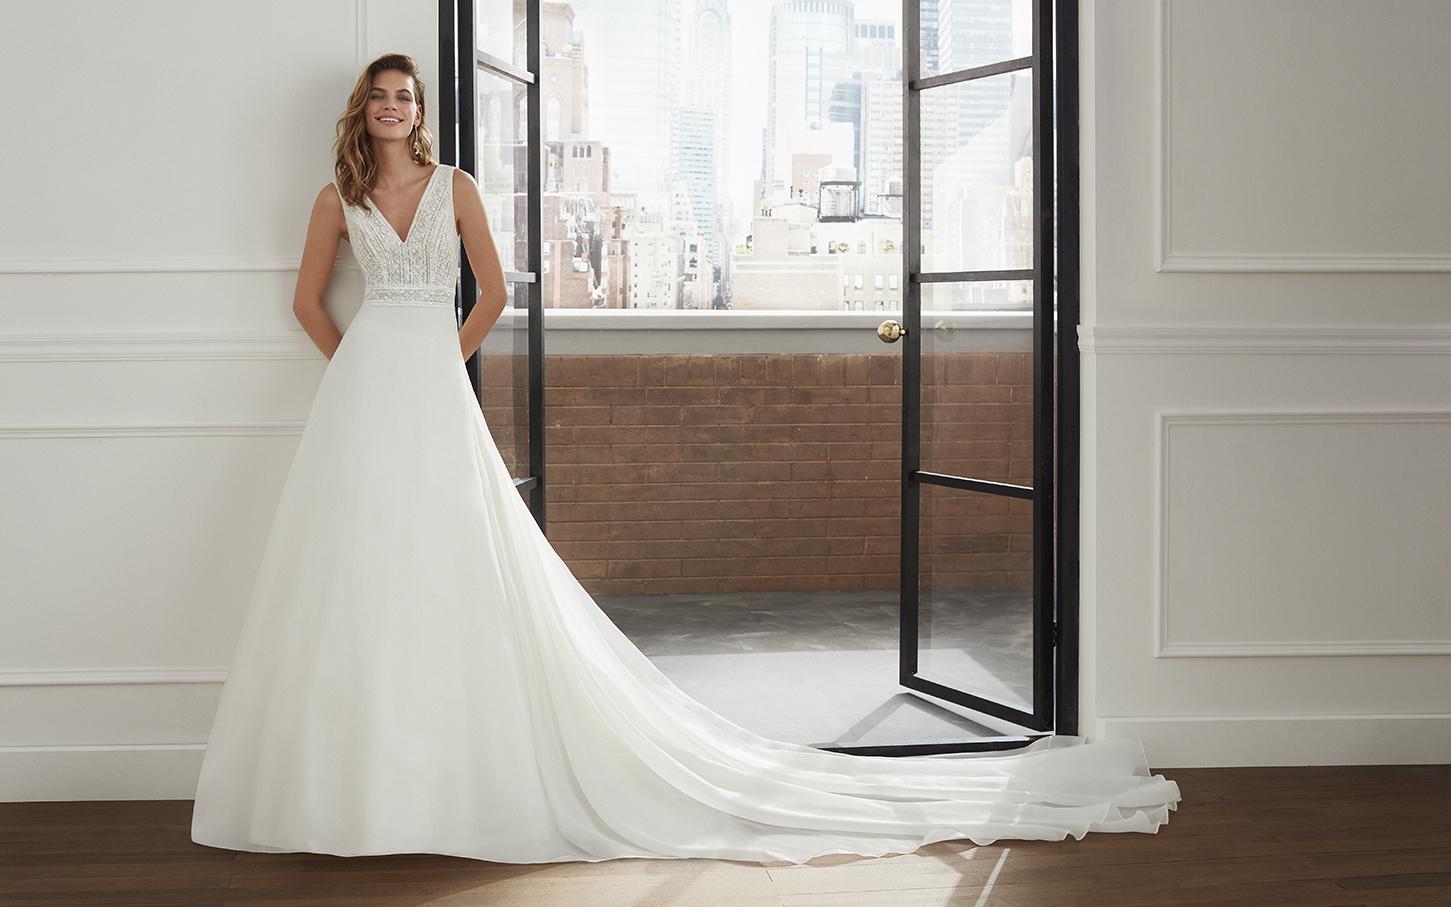 Robe de mariée chic - LOYDA